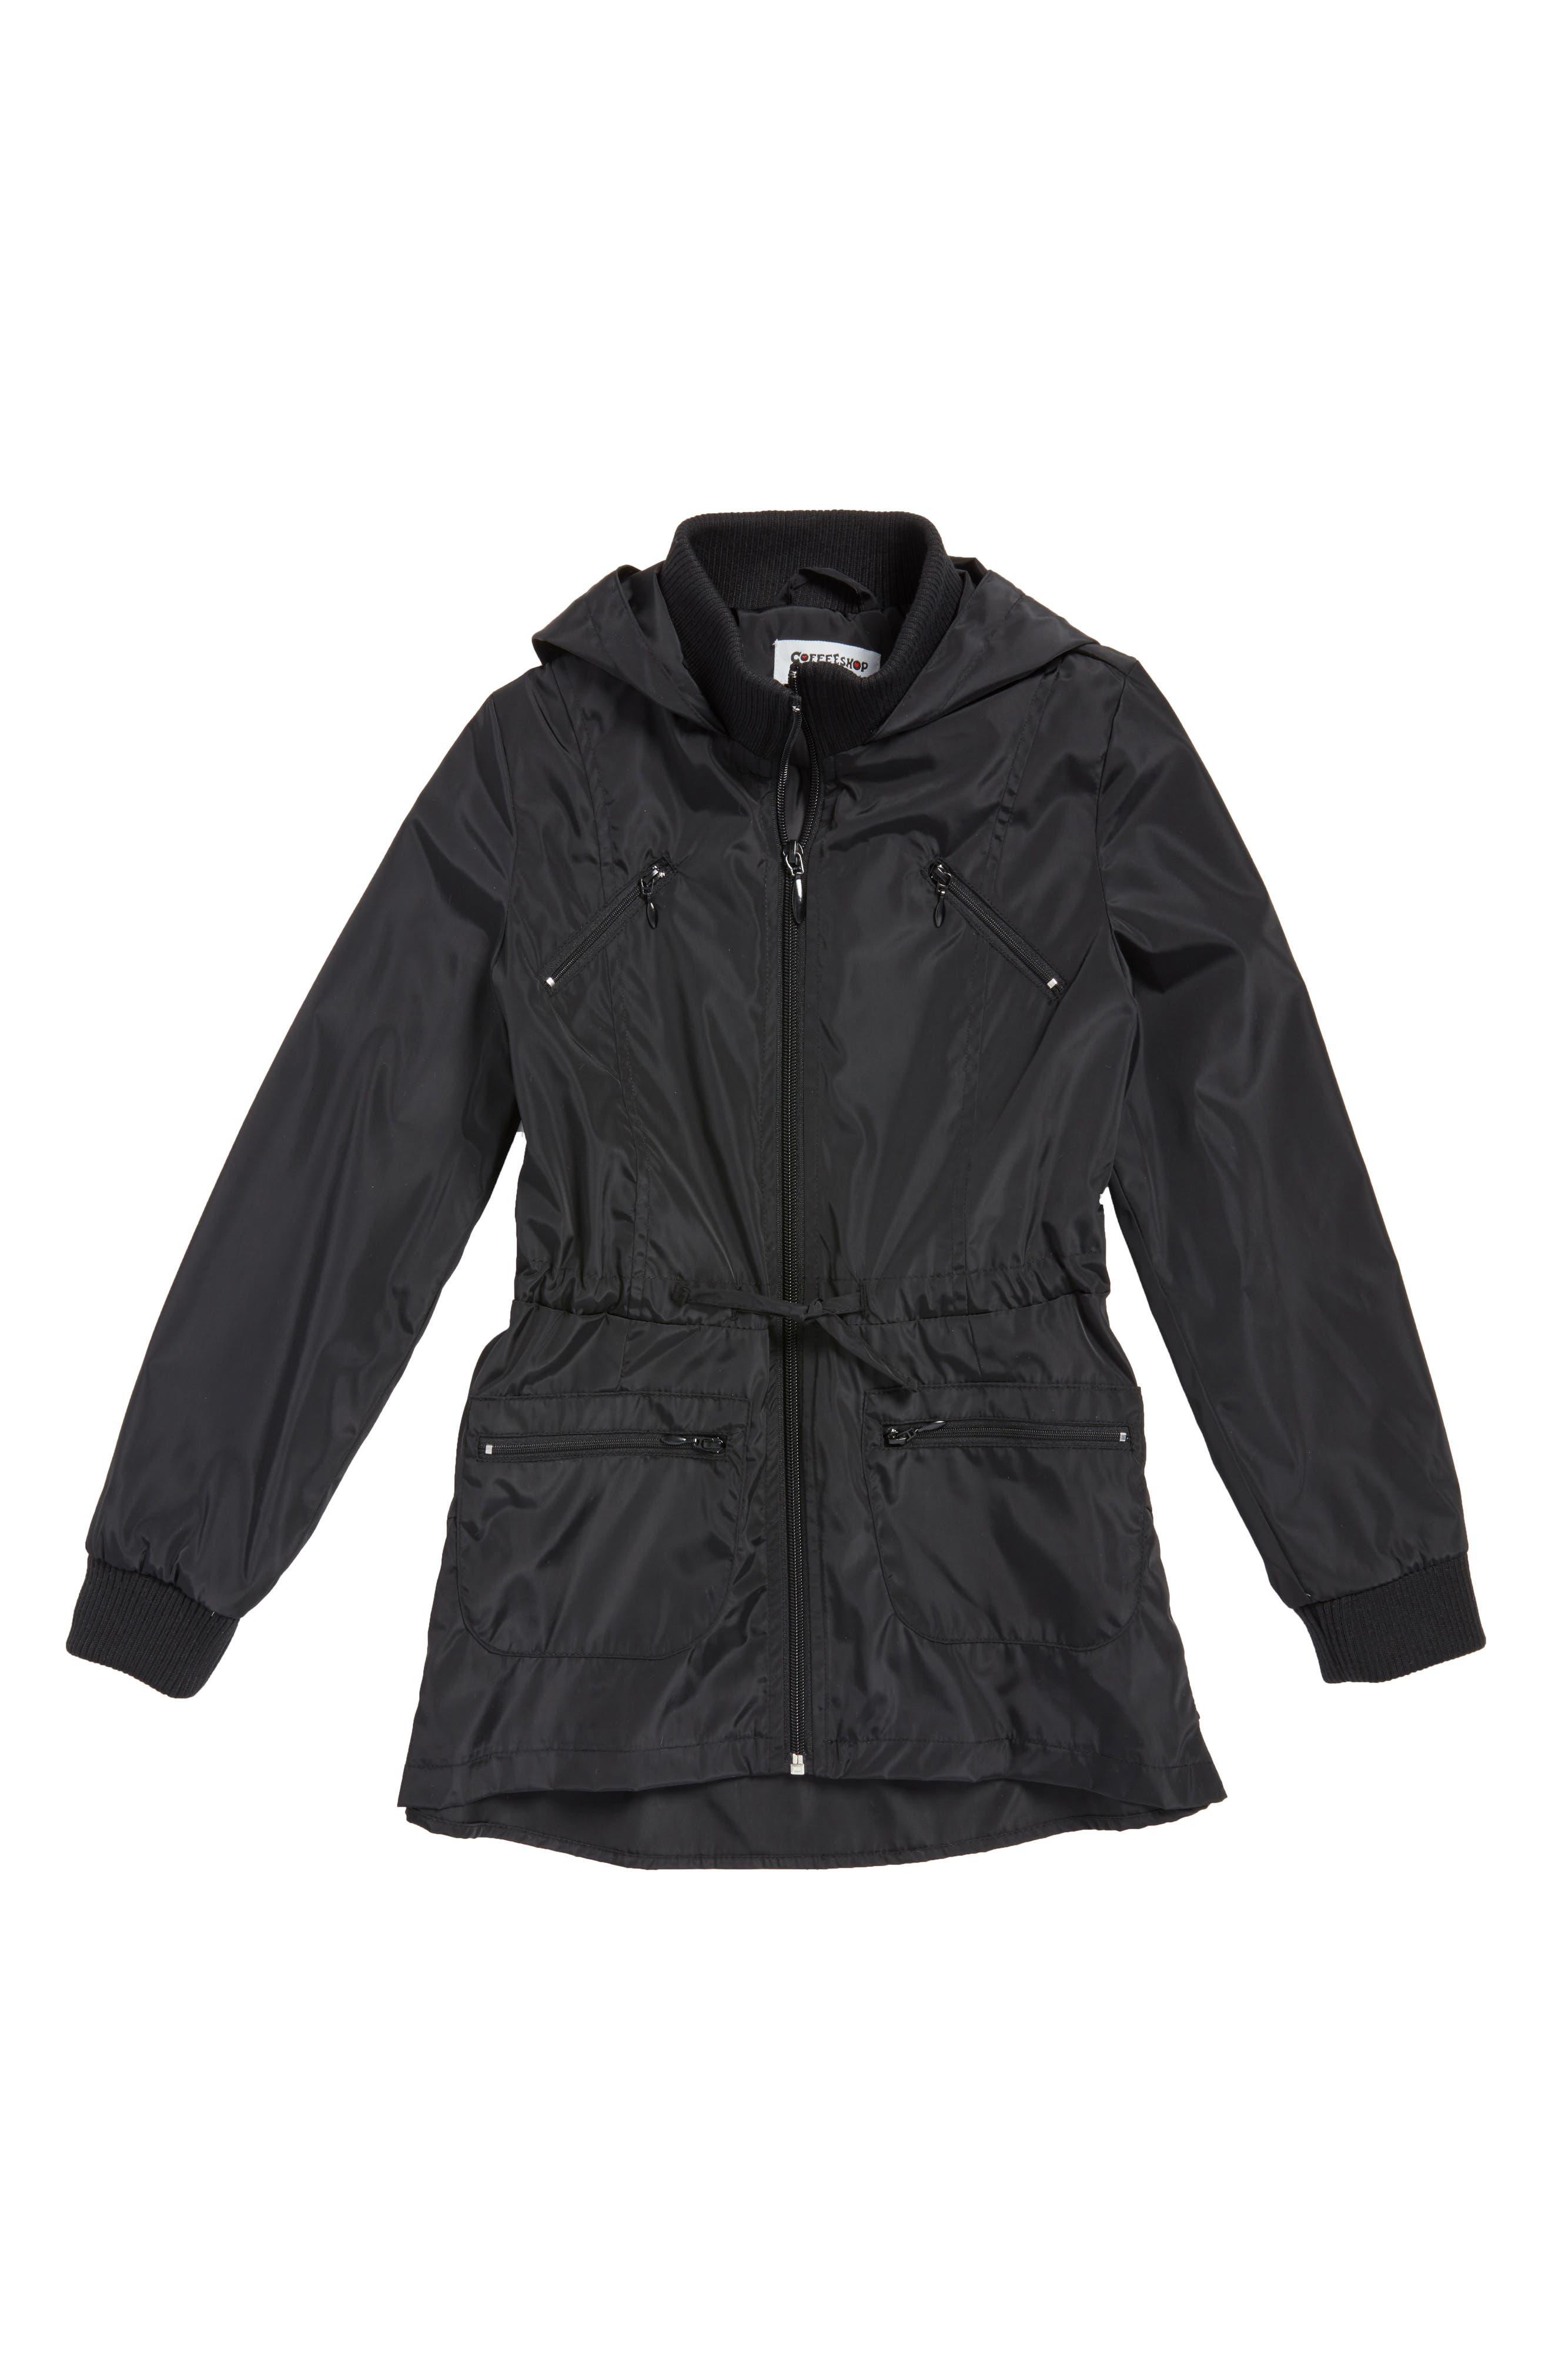 Rain Jacket,                             Main thumbnail 1, color,                             Black